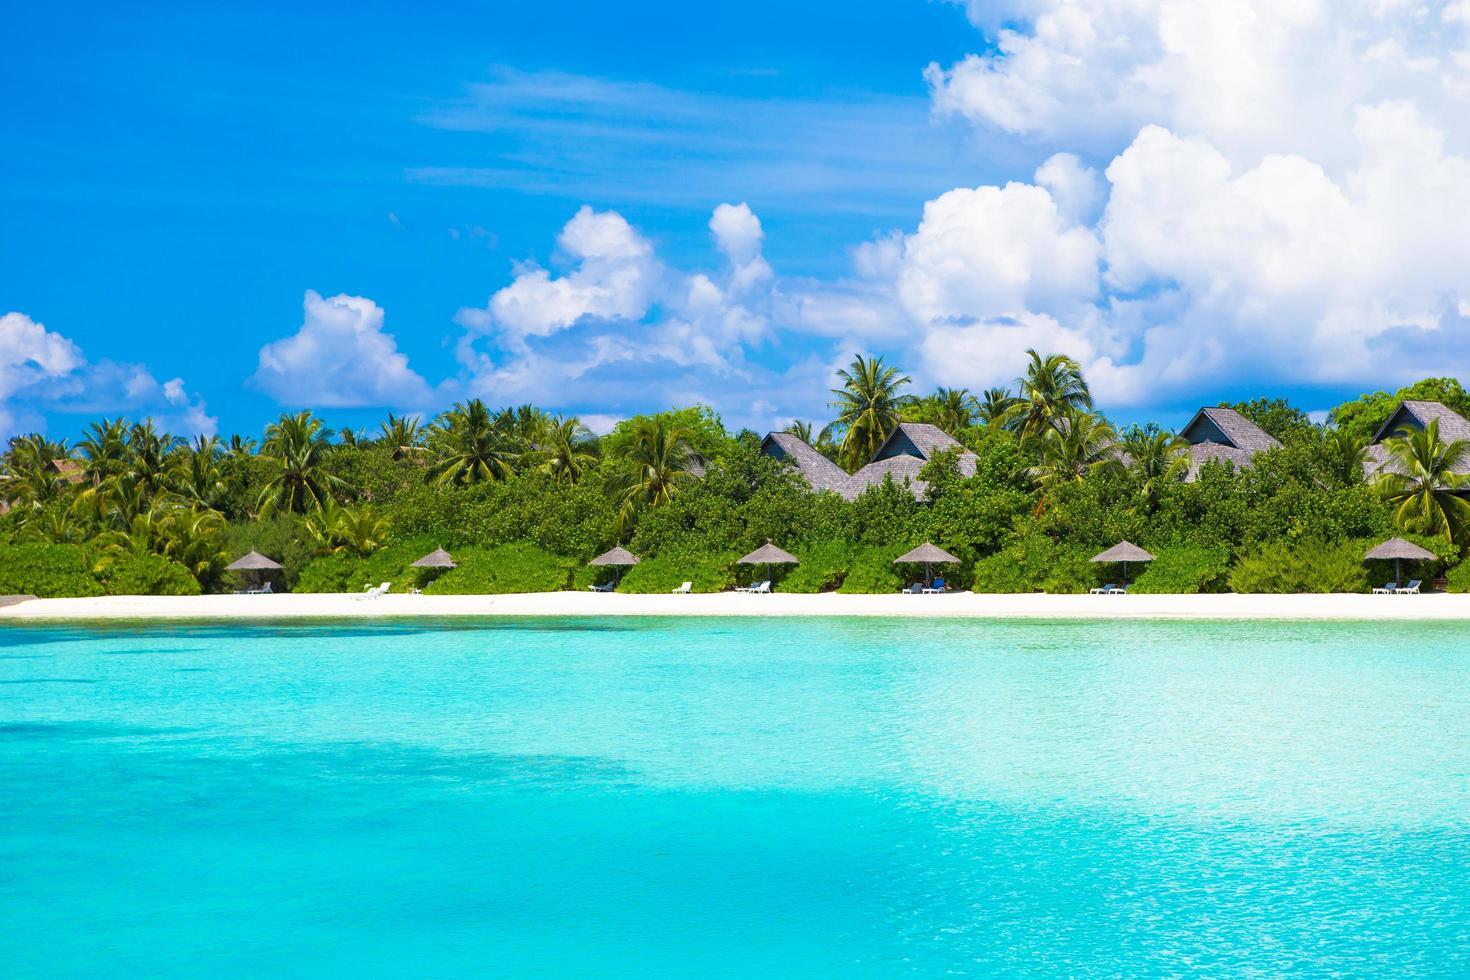 Maldives, South Asia, 2020 - Resort on a tropical island photo